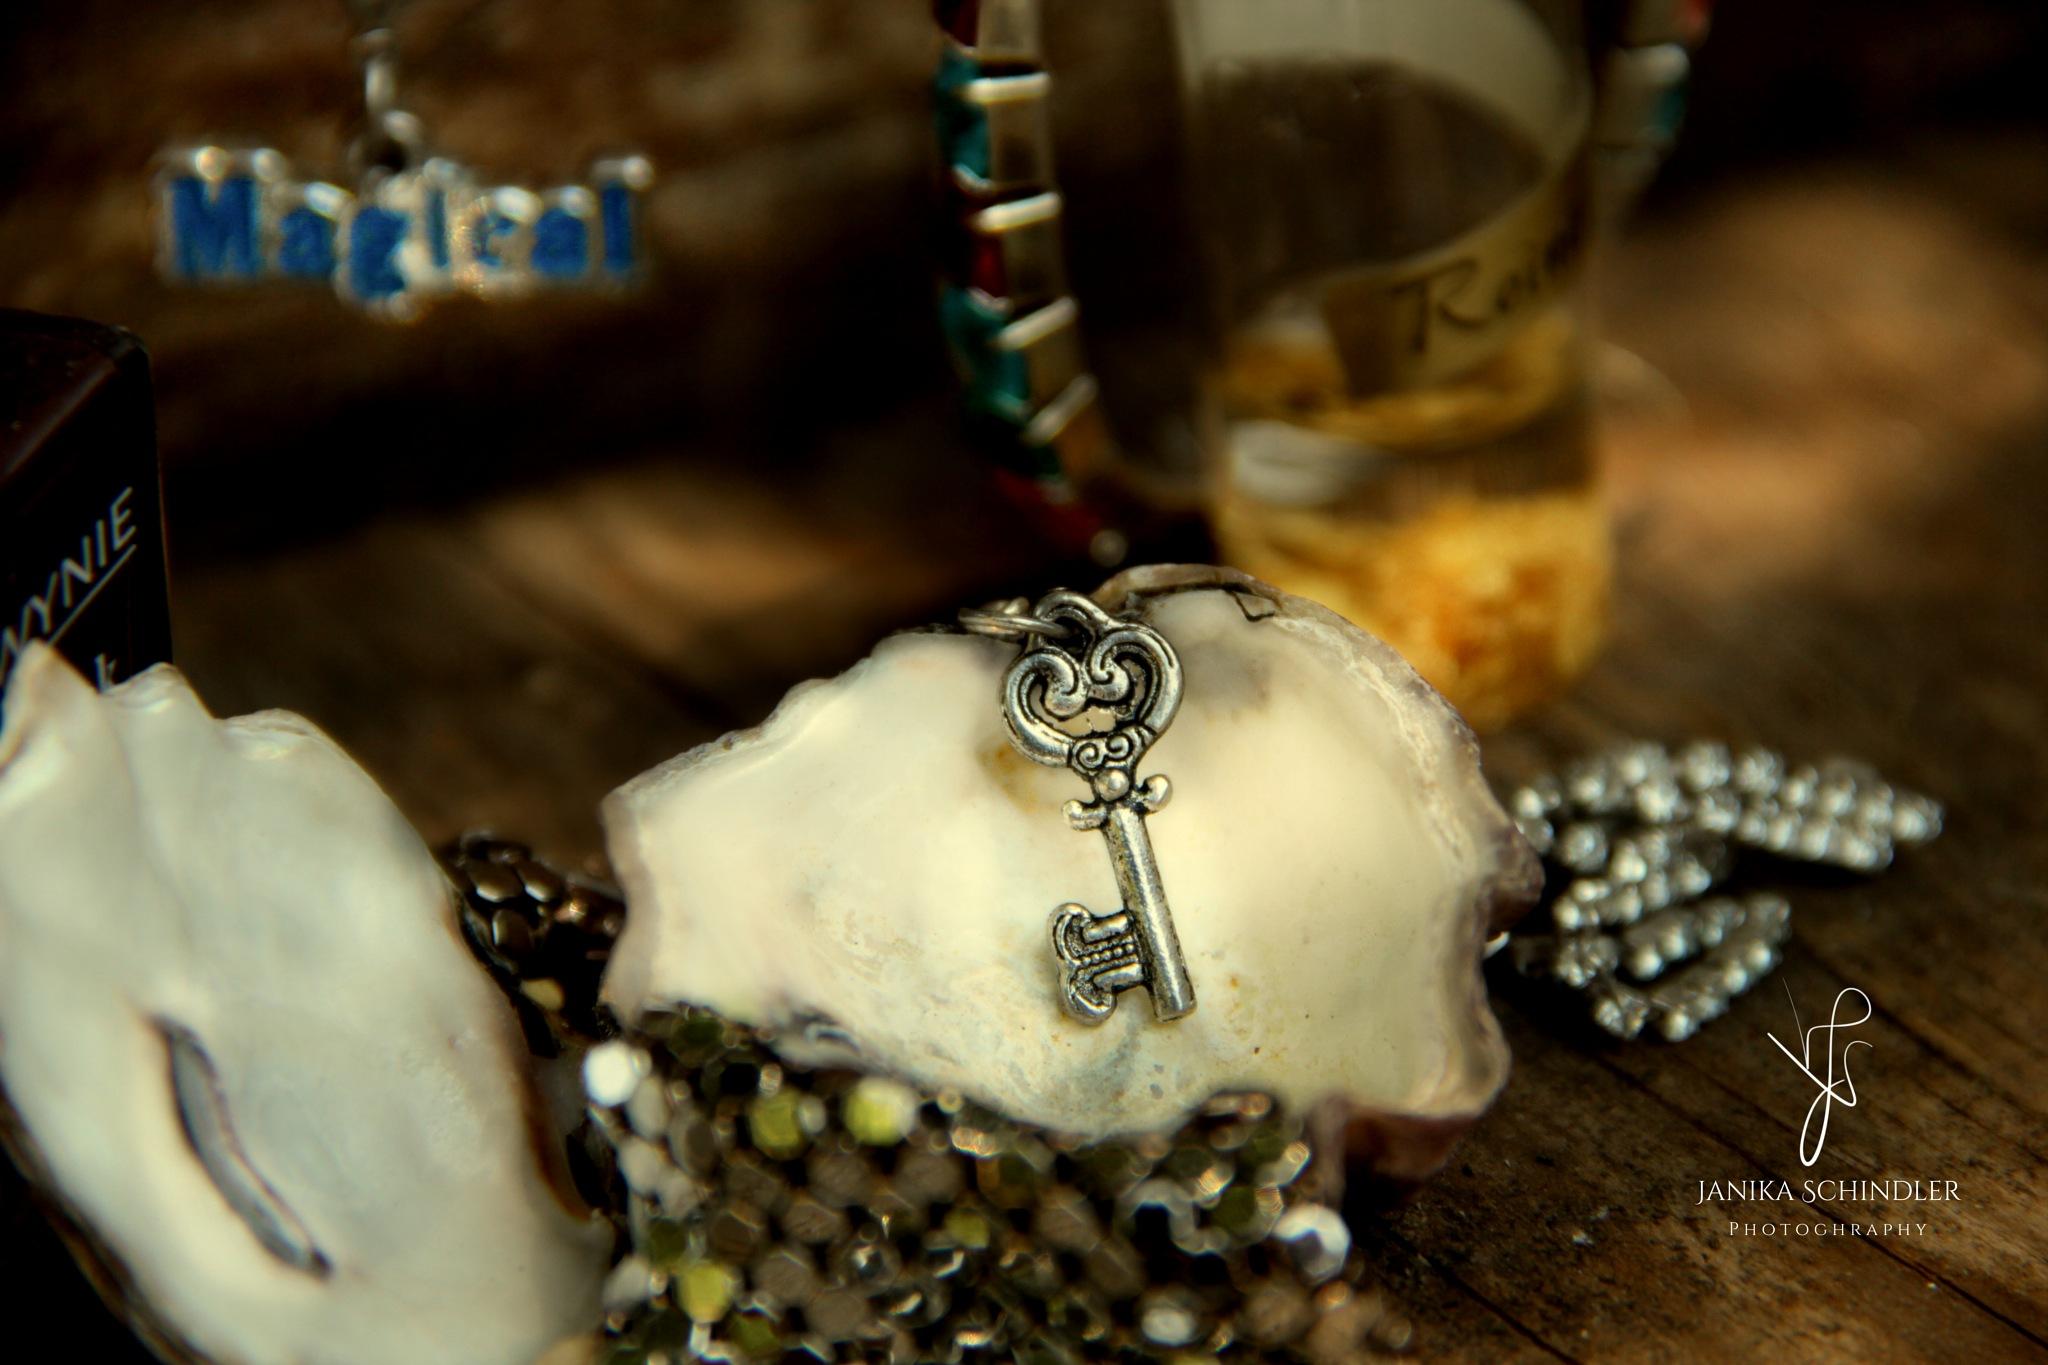 The magic key:) by Janika Schindler